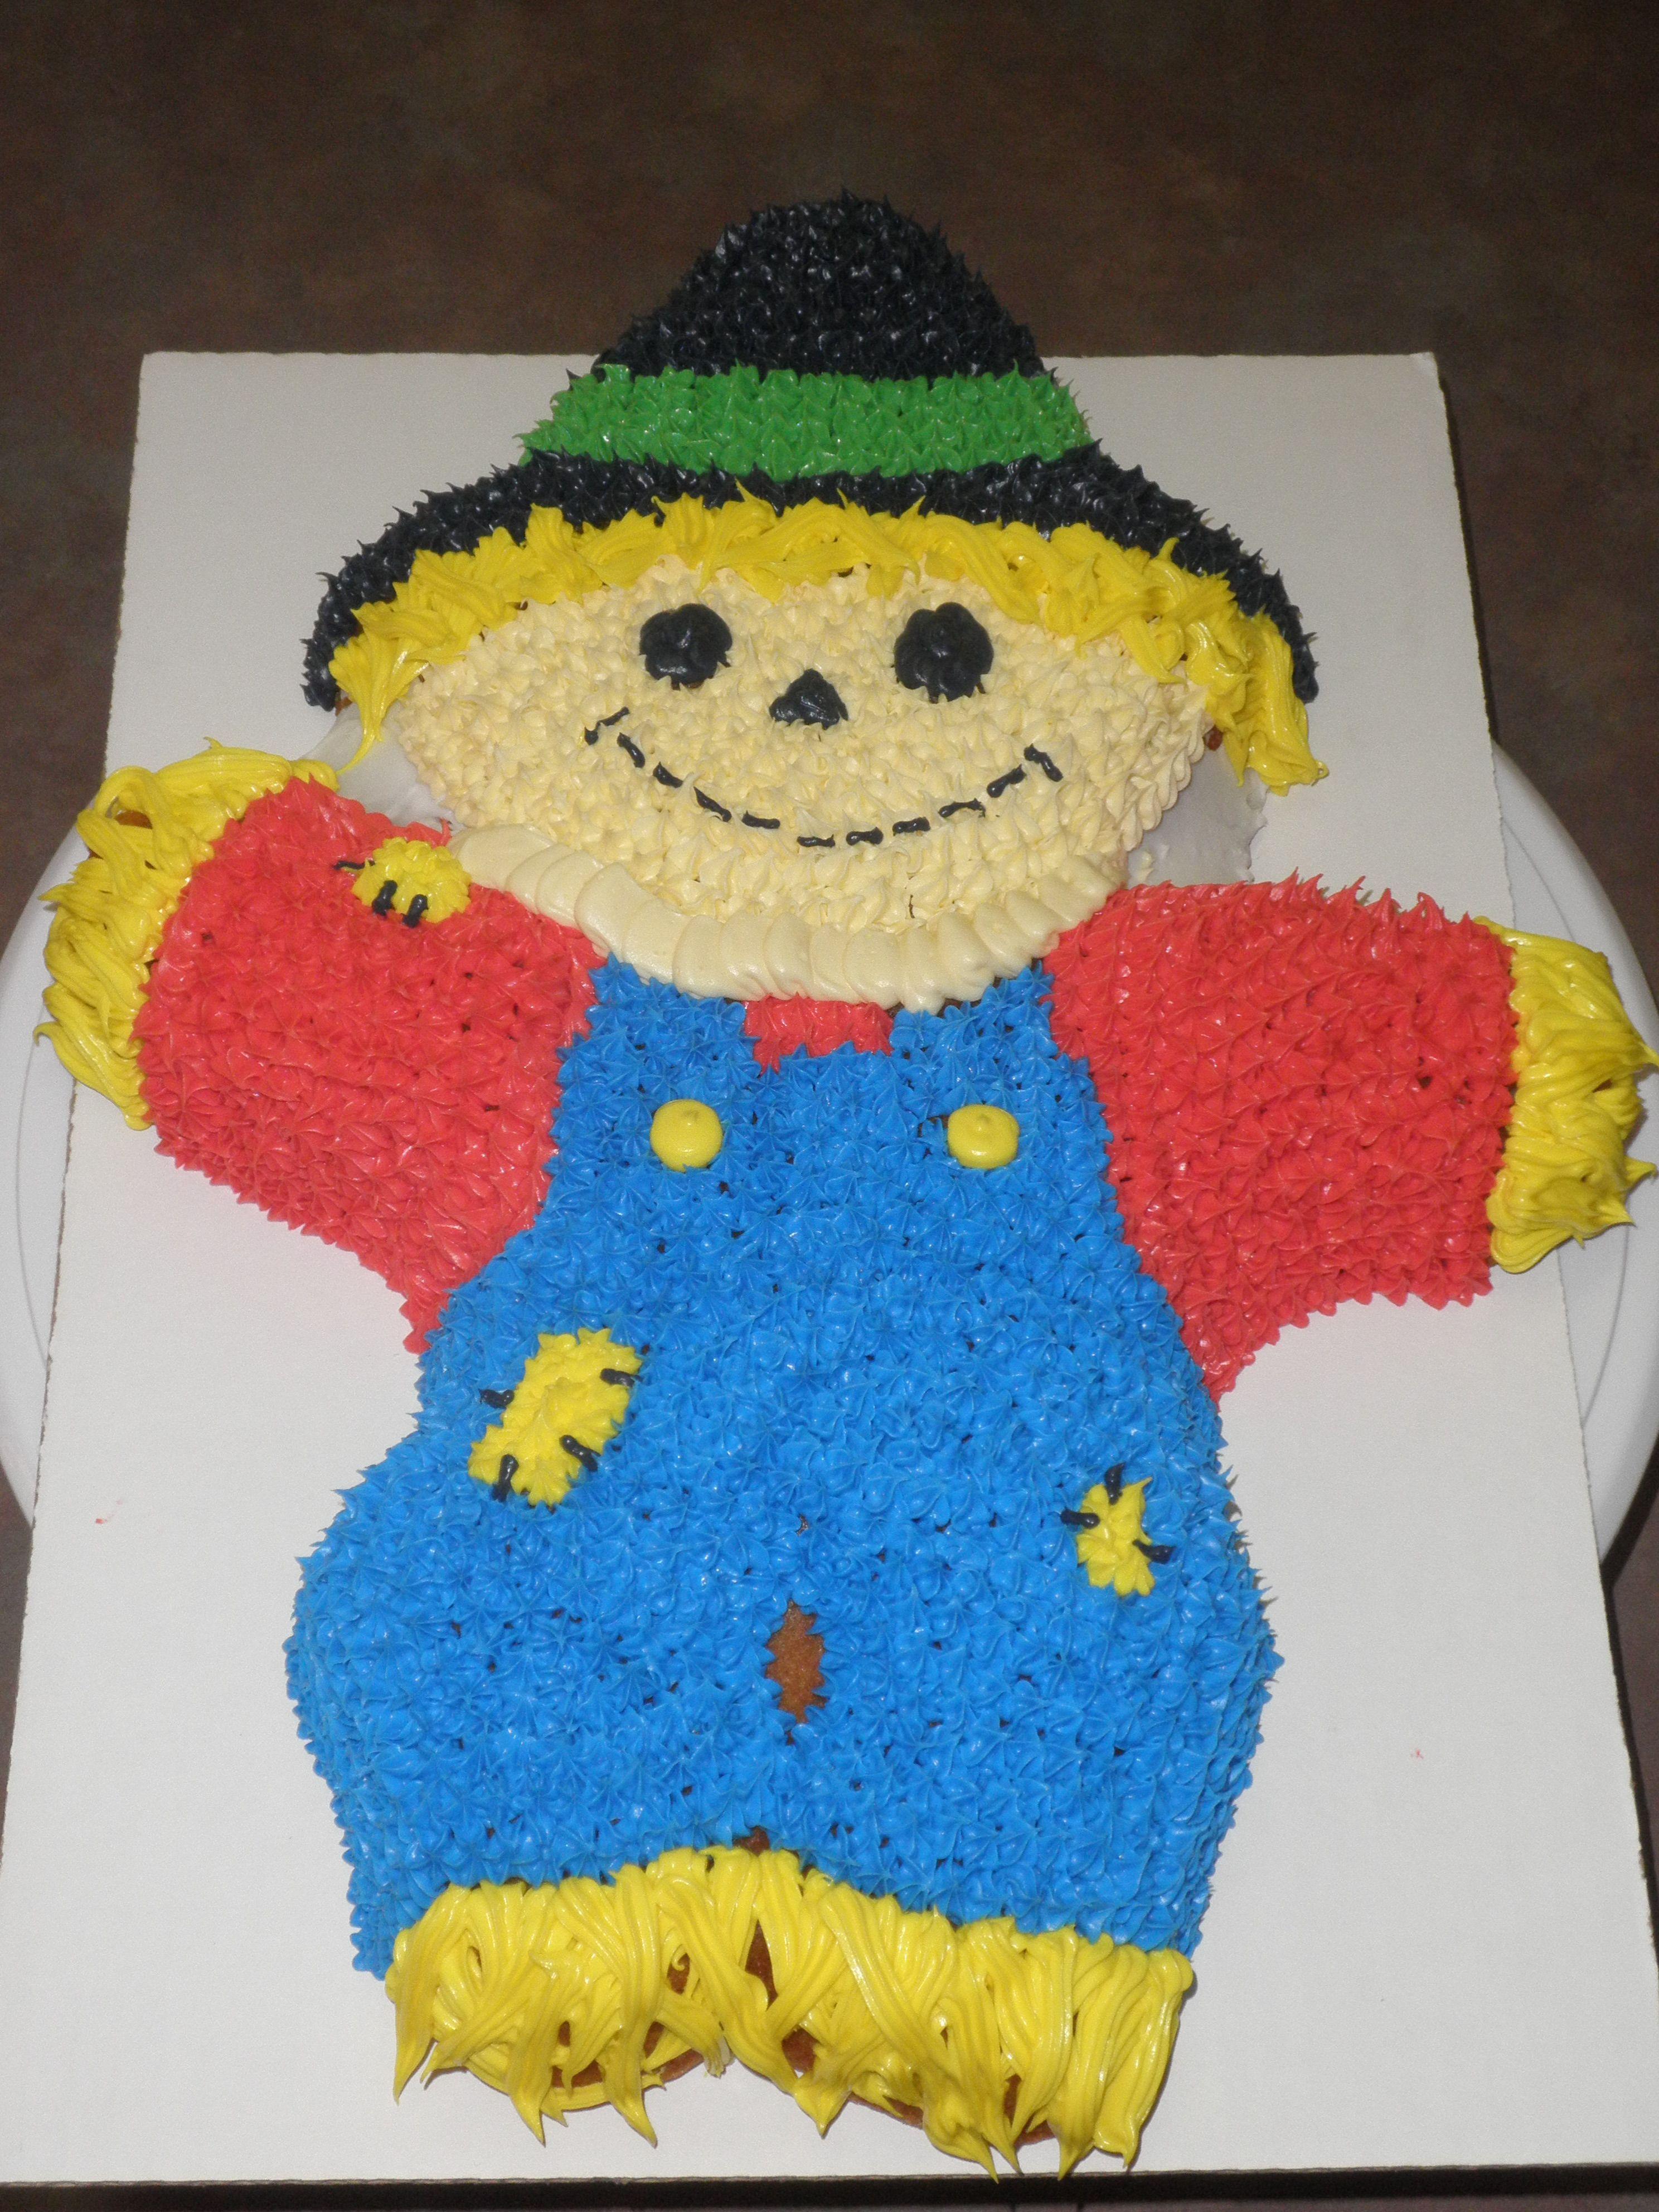 My Scarecrow cake!